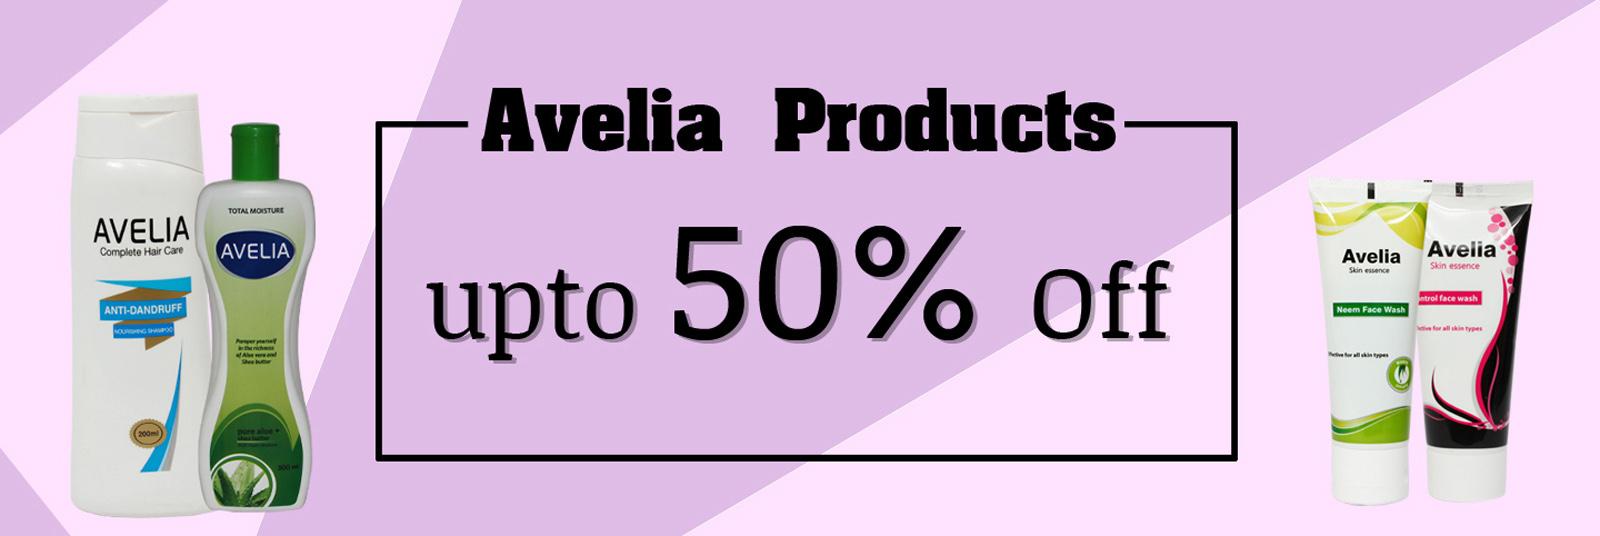 Avelia